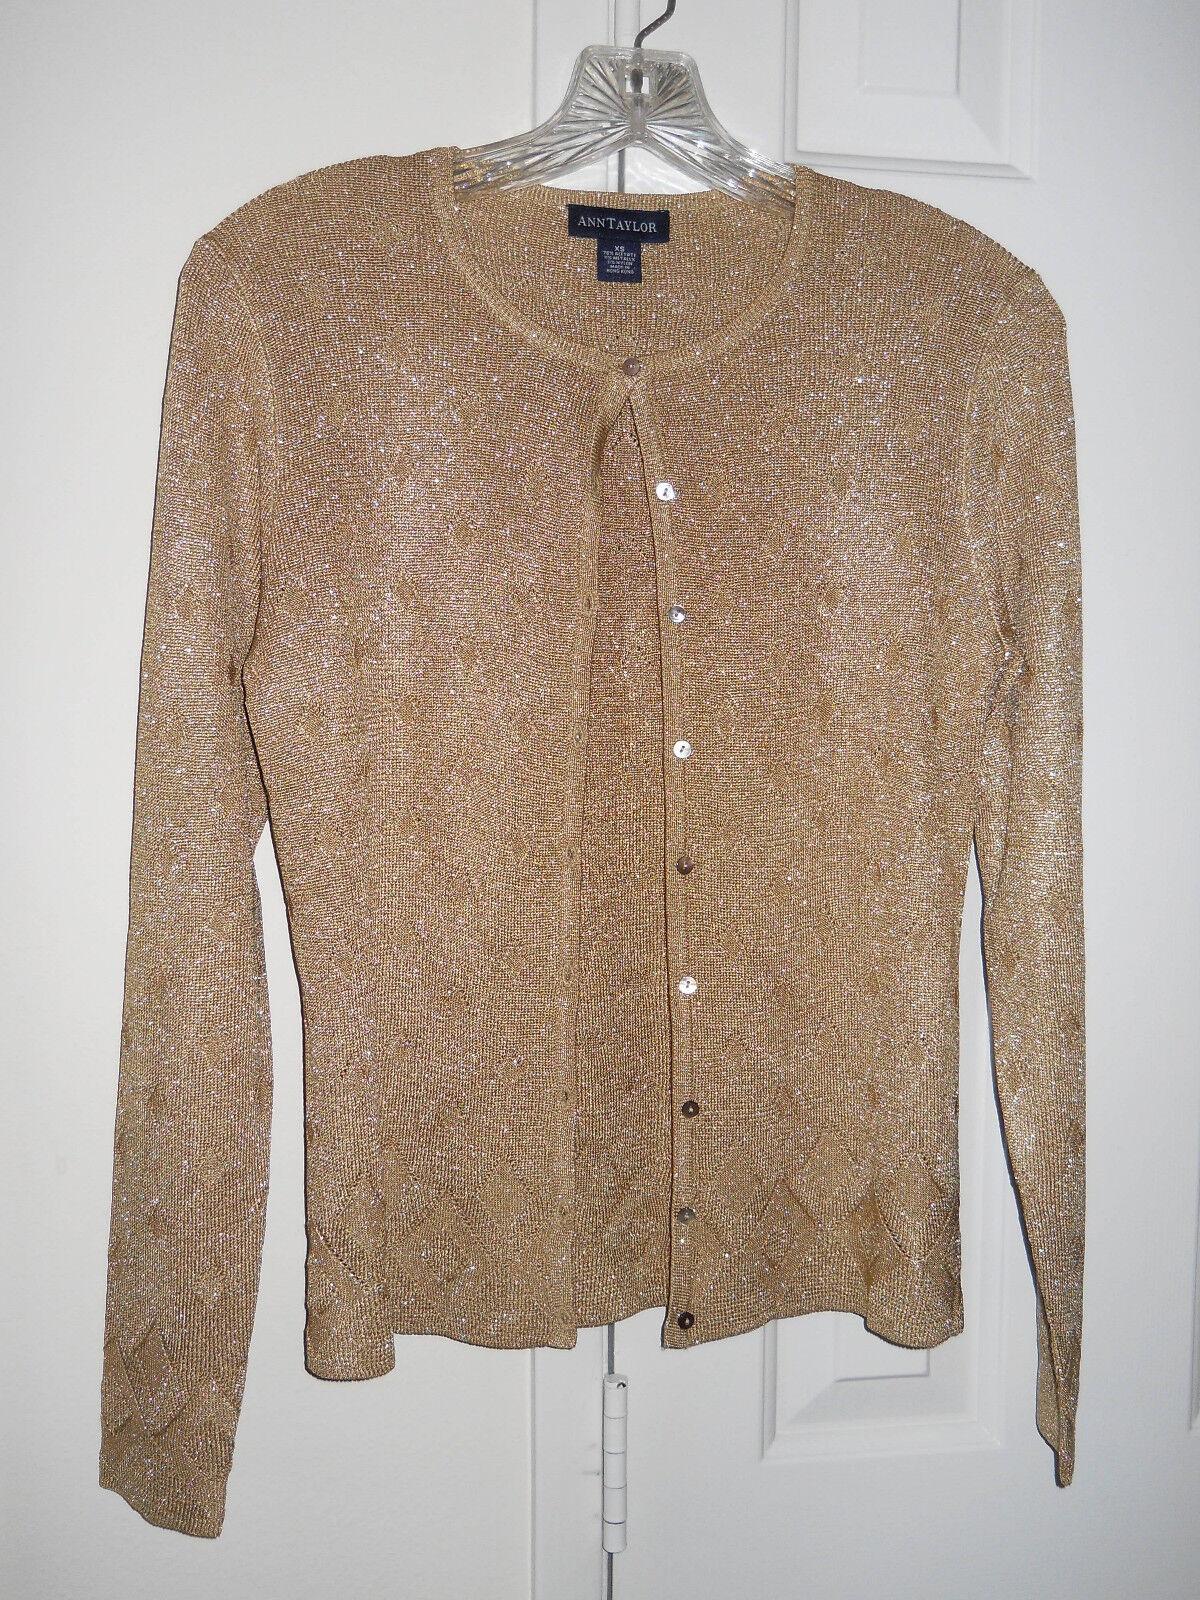 Nice 4 Holiday Ann Taylor gold Metallic Cardigan Cardigan Cardigan Buttondown Sweater XS Occasion 3264bd